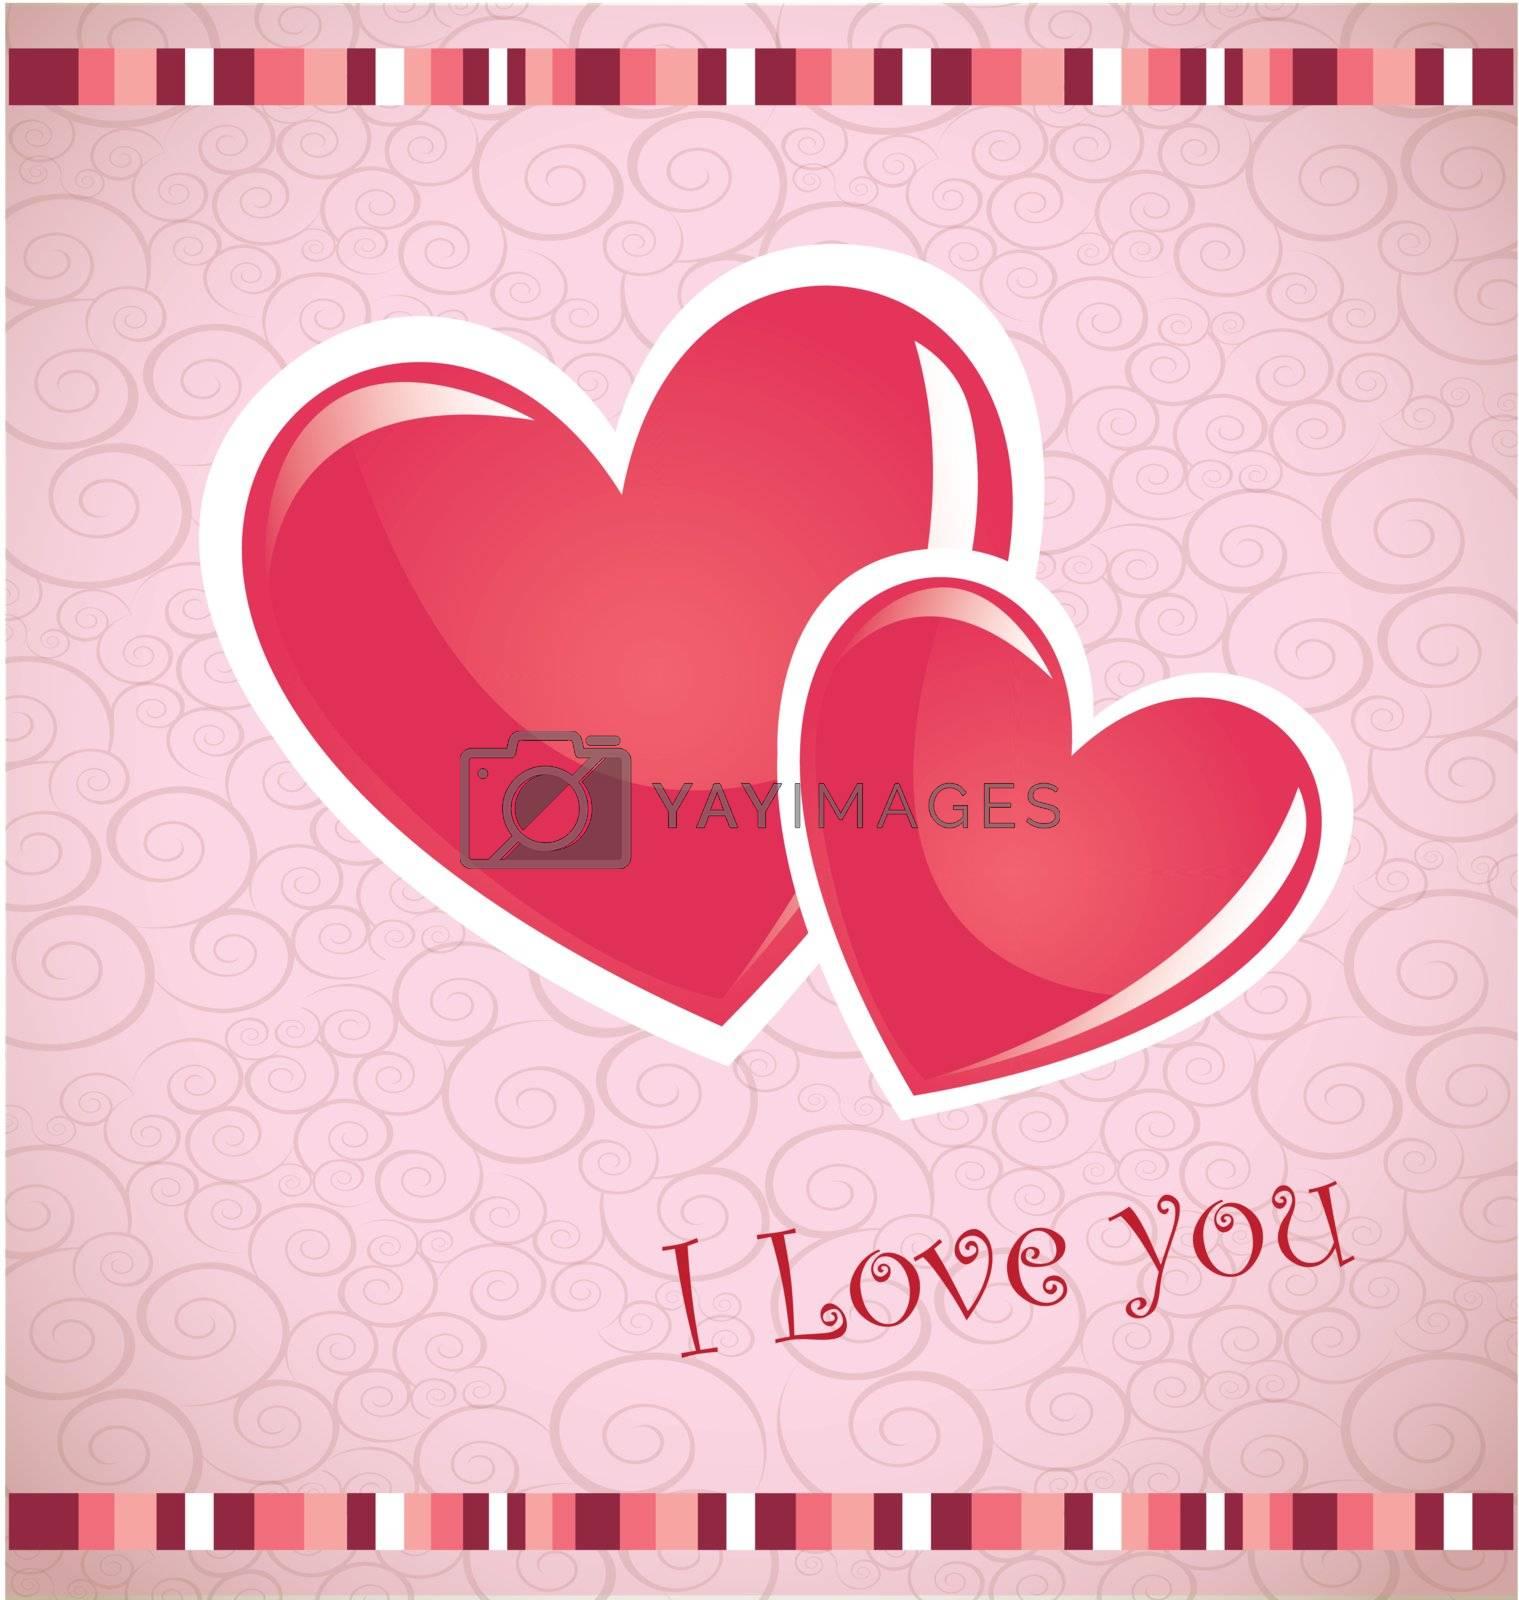 Valentines day card over pink background vector illustration